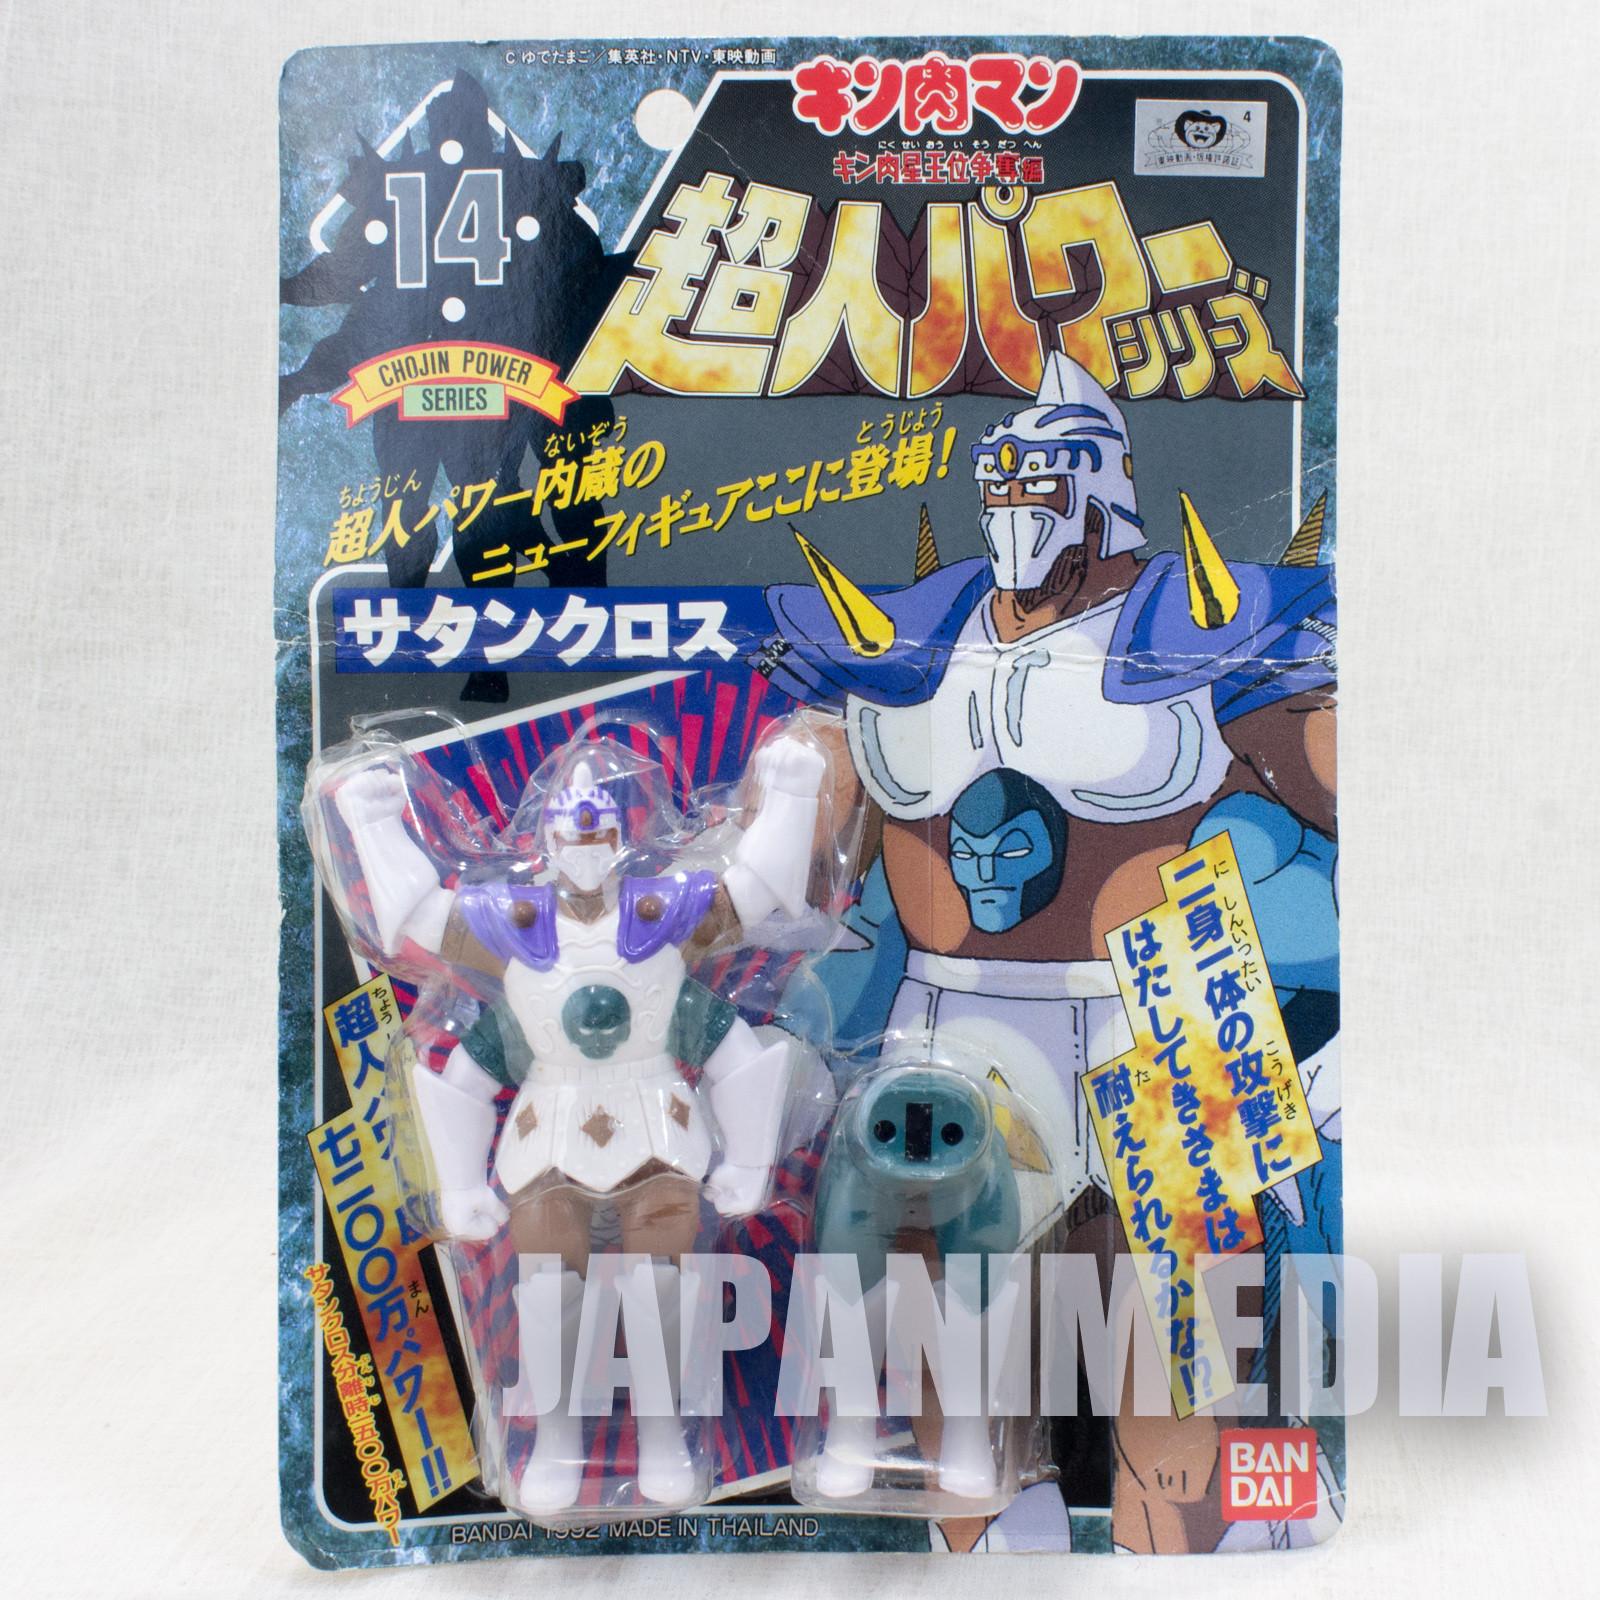 Kinnikuman Satan Cross Figure Chojin Power Series BANDAI JAPAN ULTIMATE MUSCLE